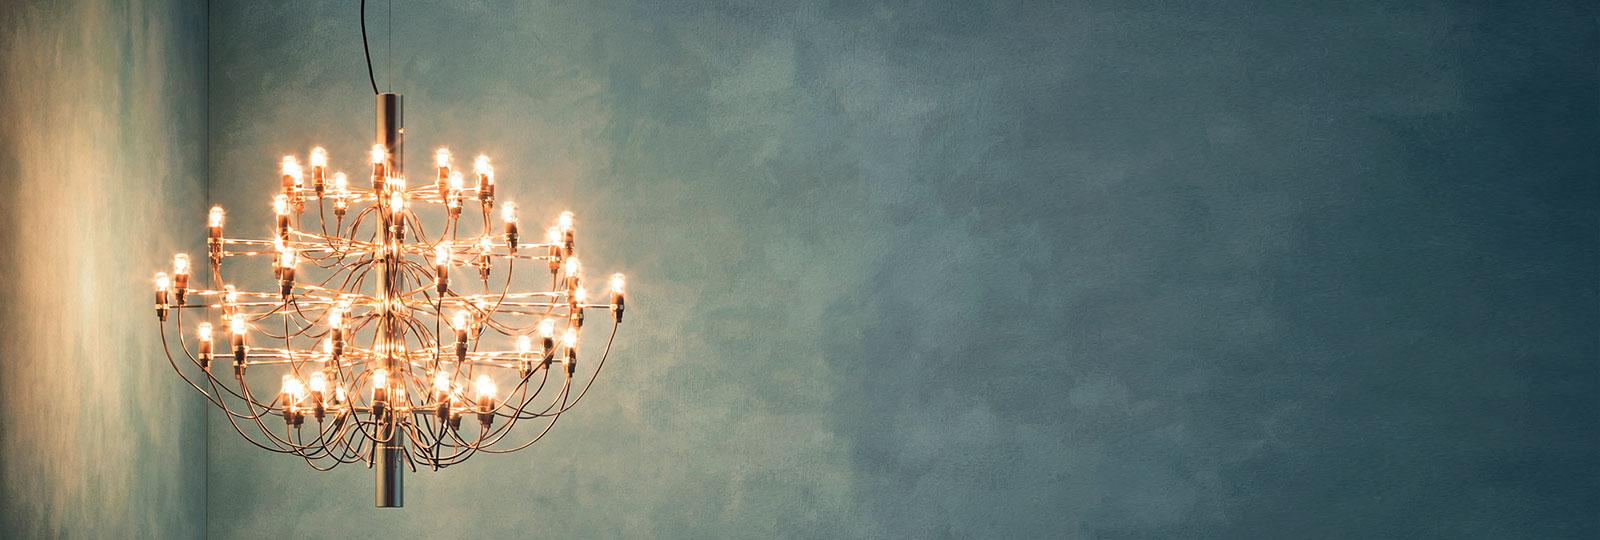 Unika Flos - Modern exklusiv belysning | Nordiska Galleriet BG-93